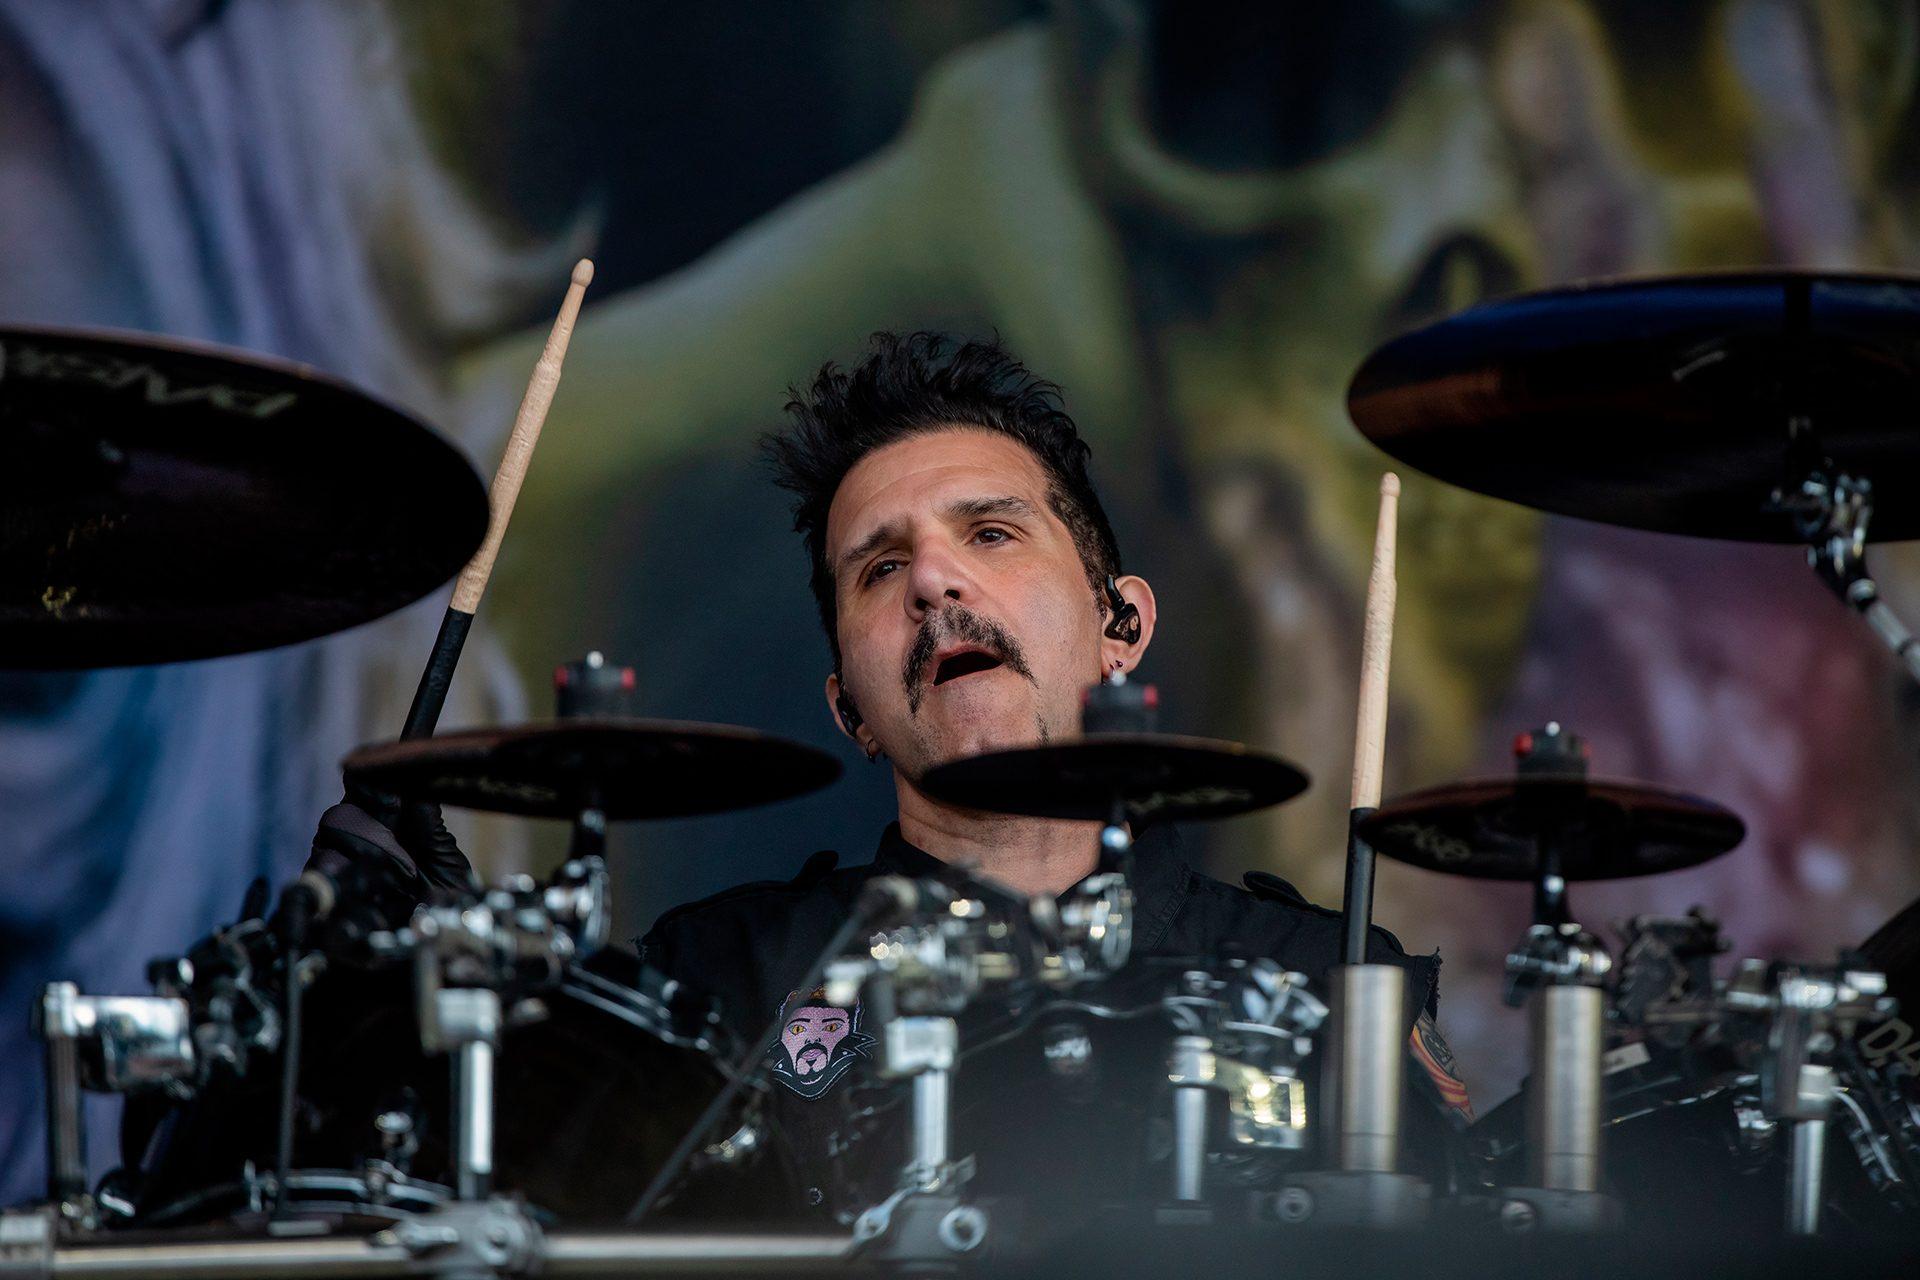 Charlie Benante, Anthrax band, drummer, Tuska metal festival